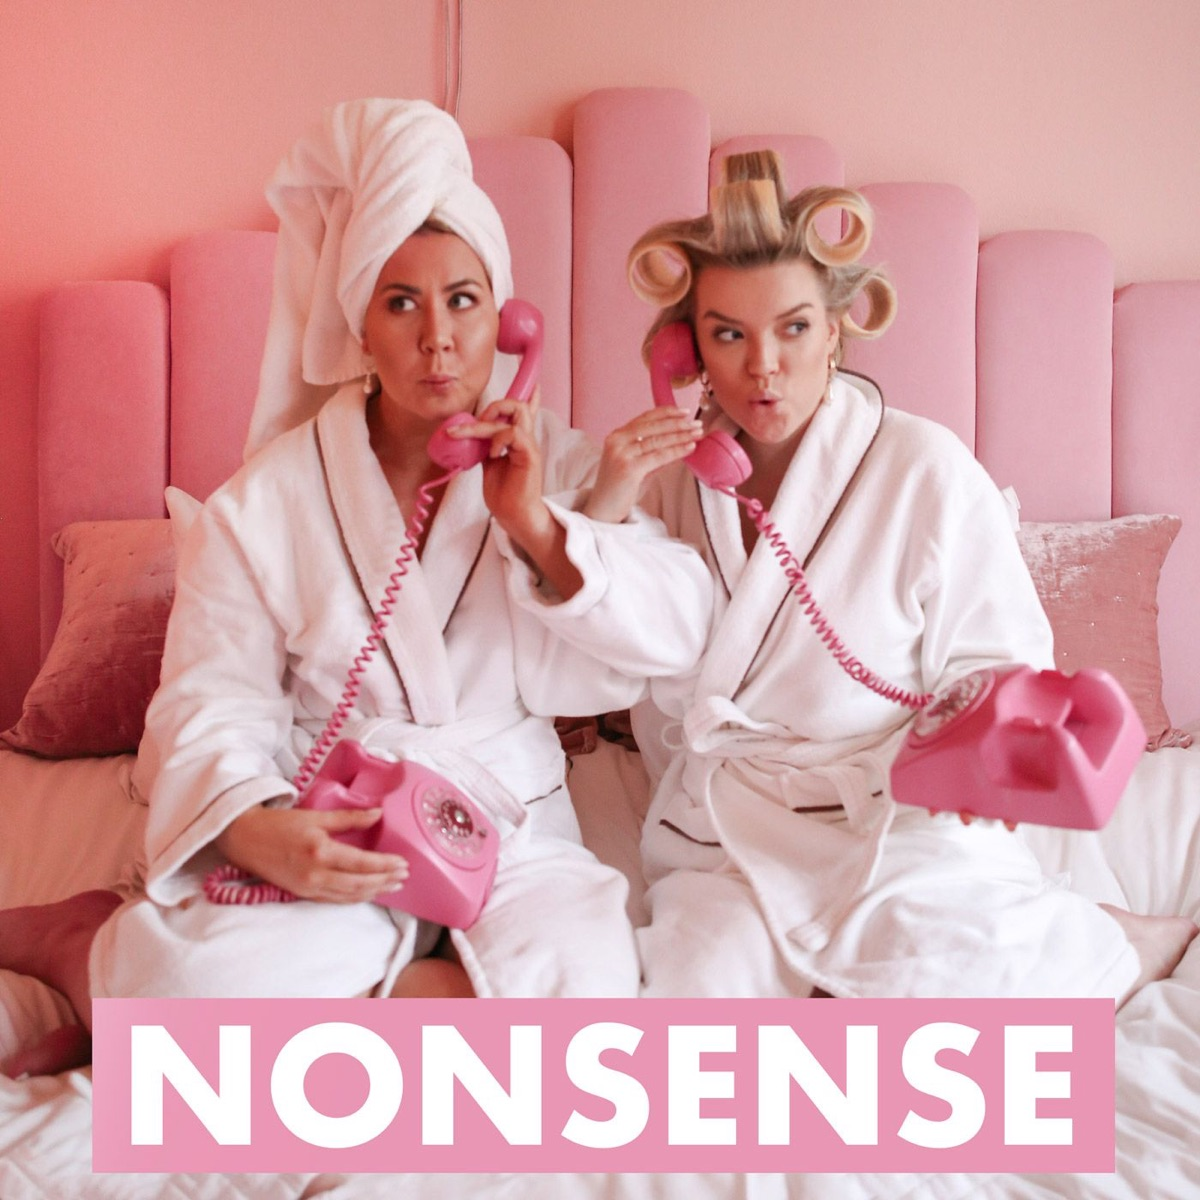 Nonsense by Alexa & Linda